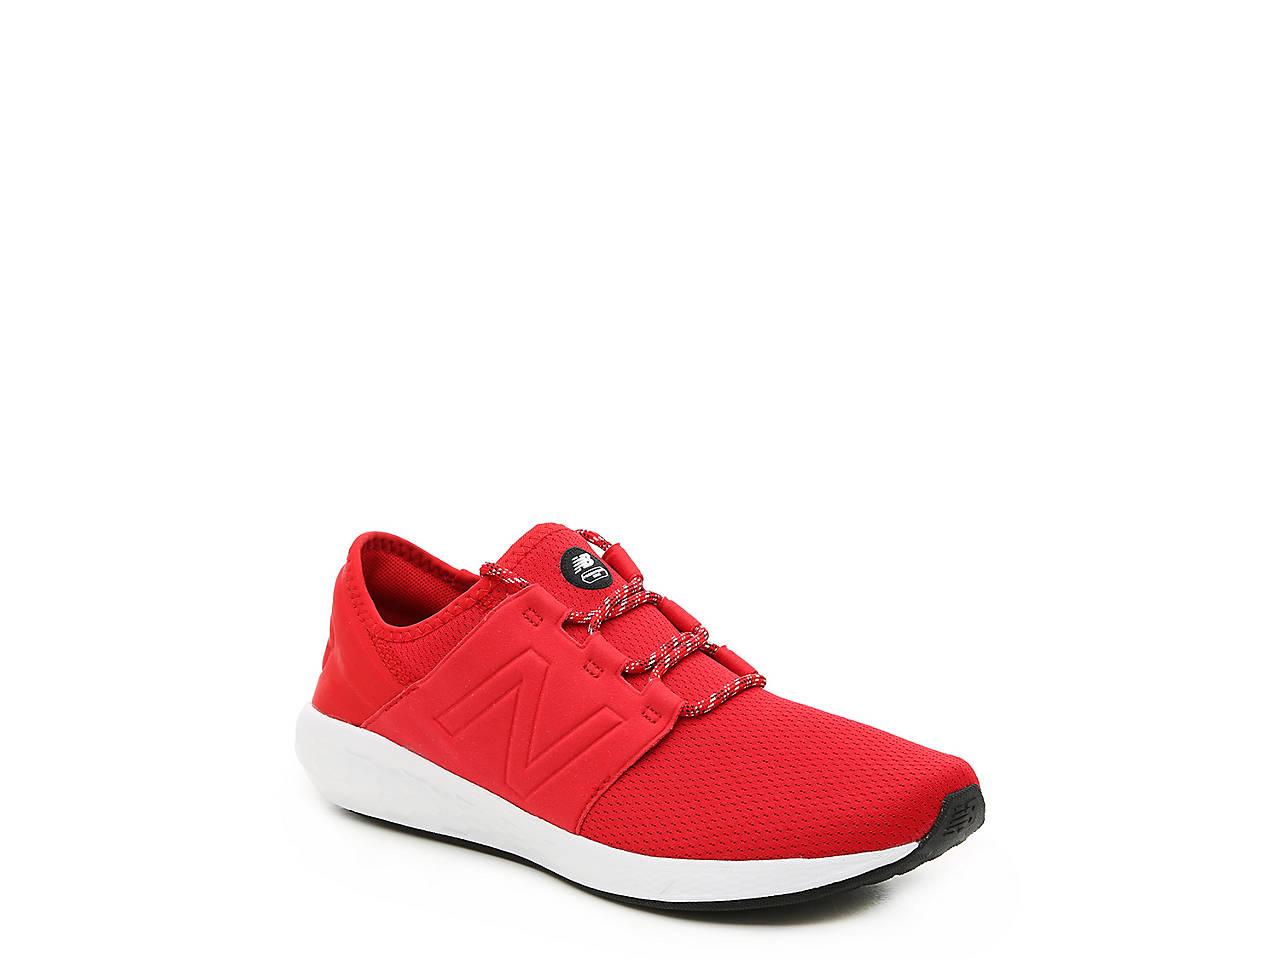 100% authentic 86335 e071c New Balance. Fresh Foam Cruz v2 Toddler   Youth Sneaker